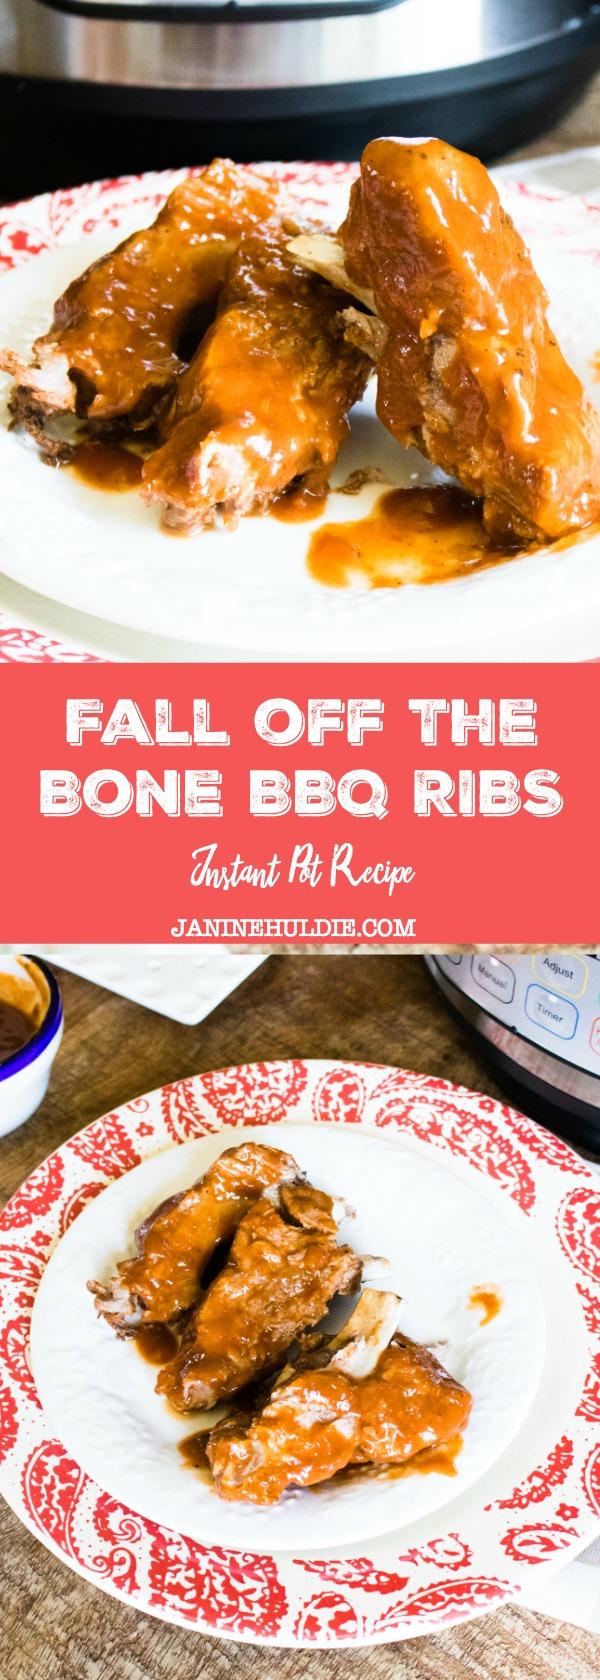 Fall of the Bone BBQ Ribs Instant Pot Recipe